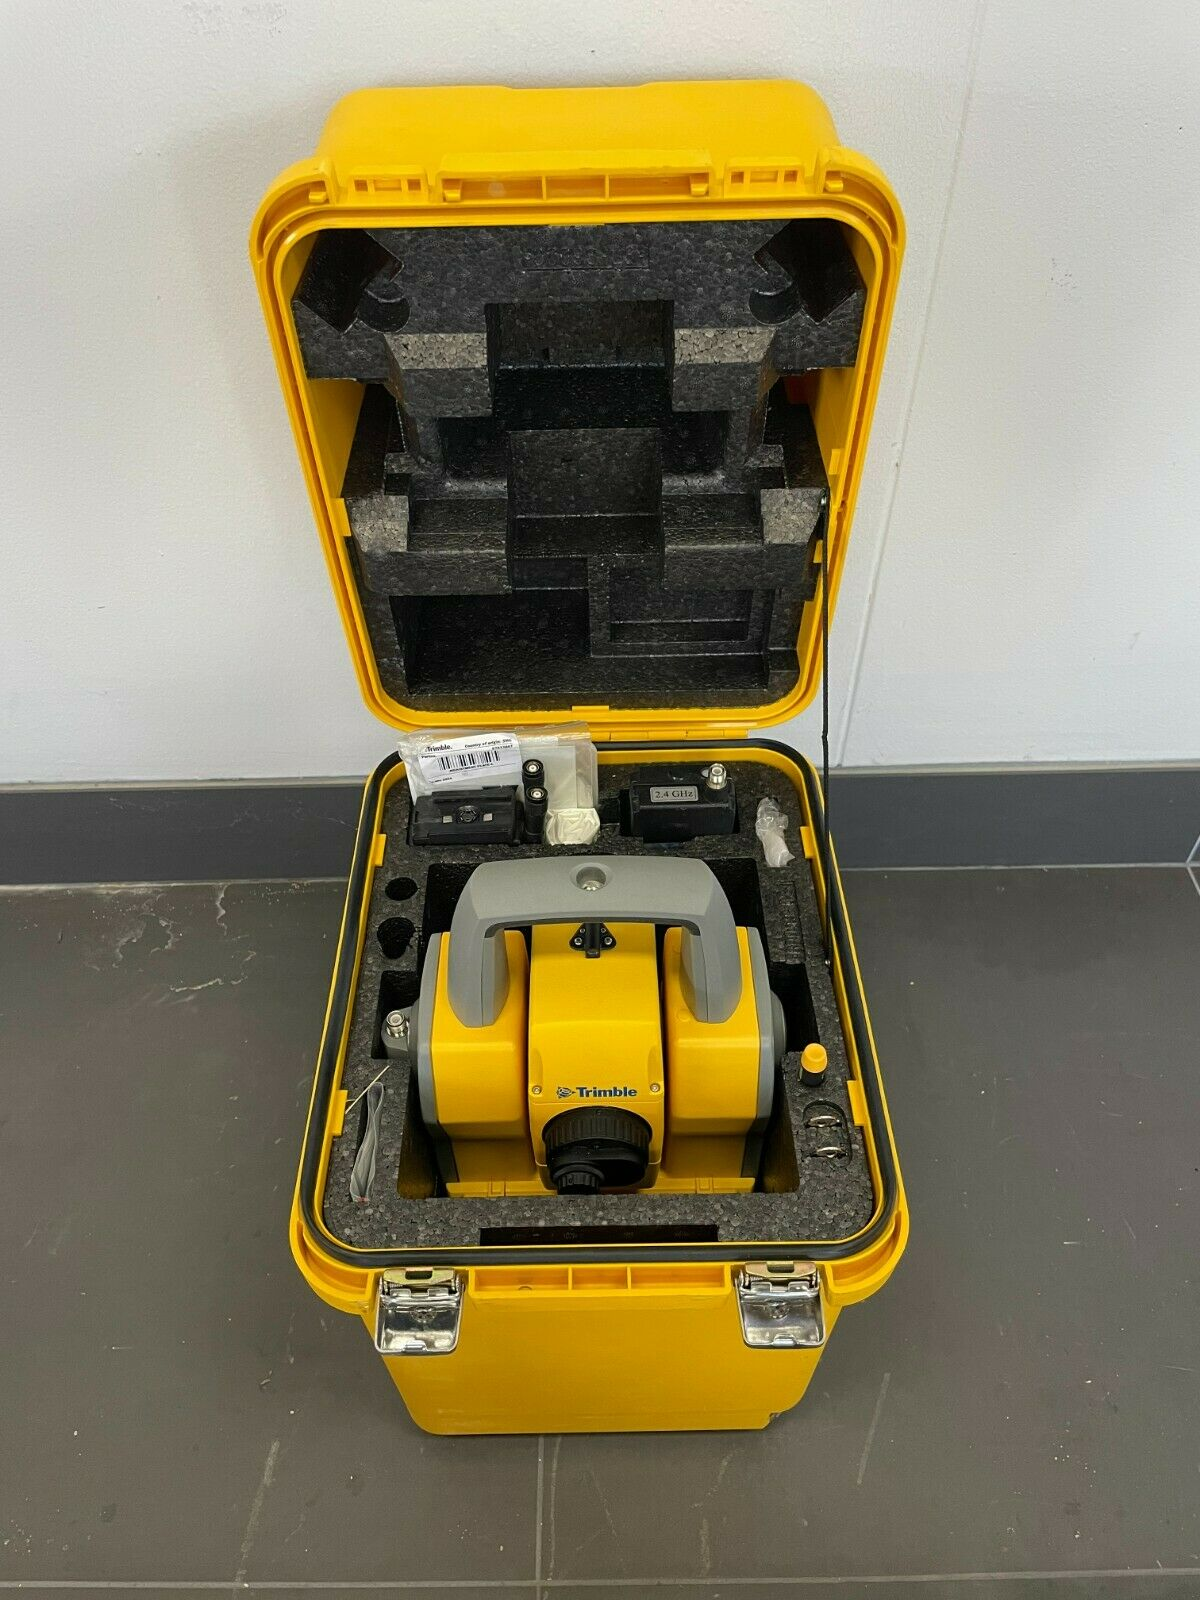 Trimble 5605 DR Standard Robotic Total Station w/ Trimble 2.4 GHz Georadio 5600